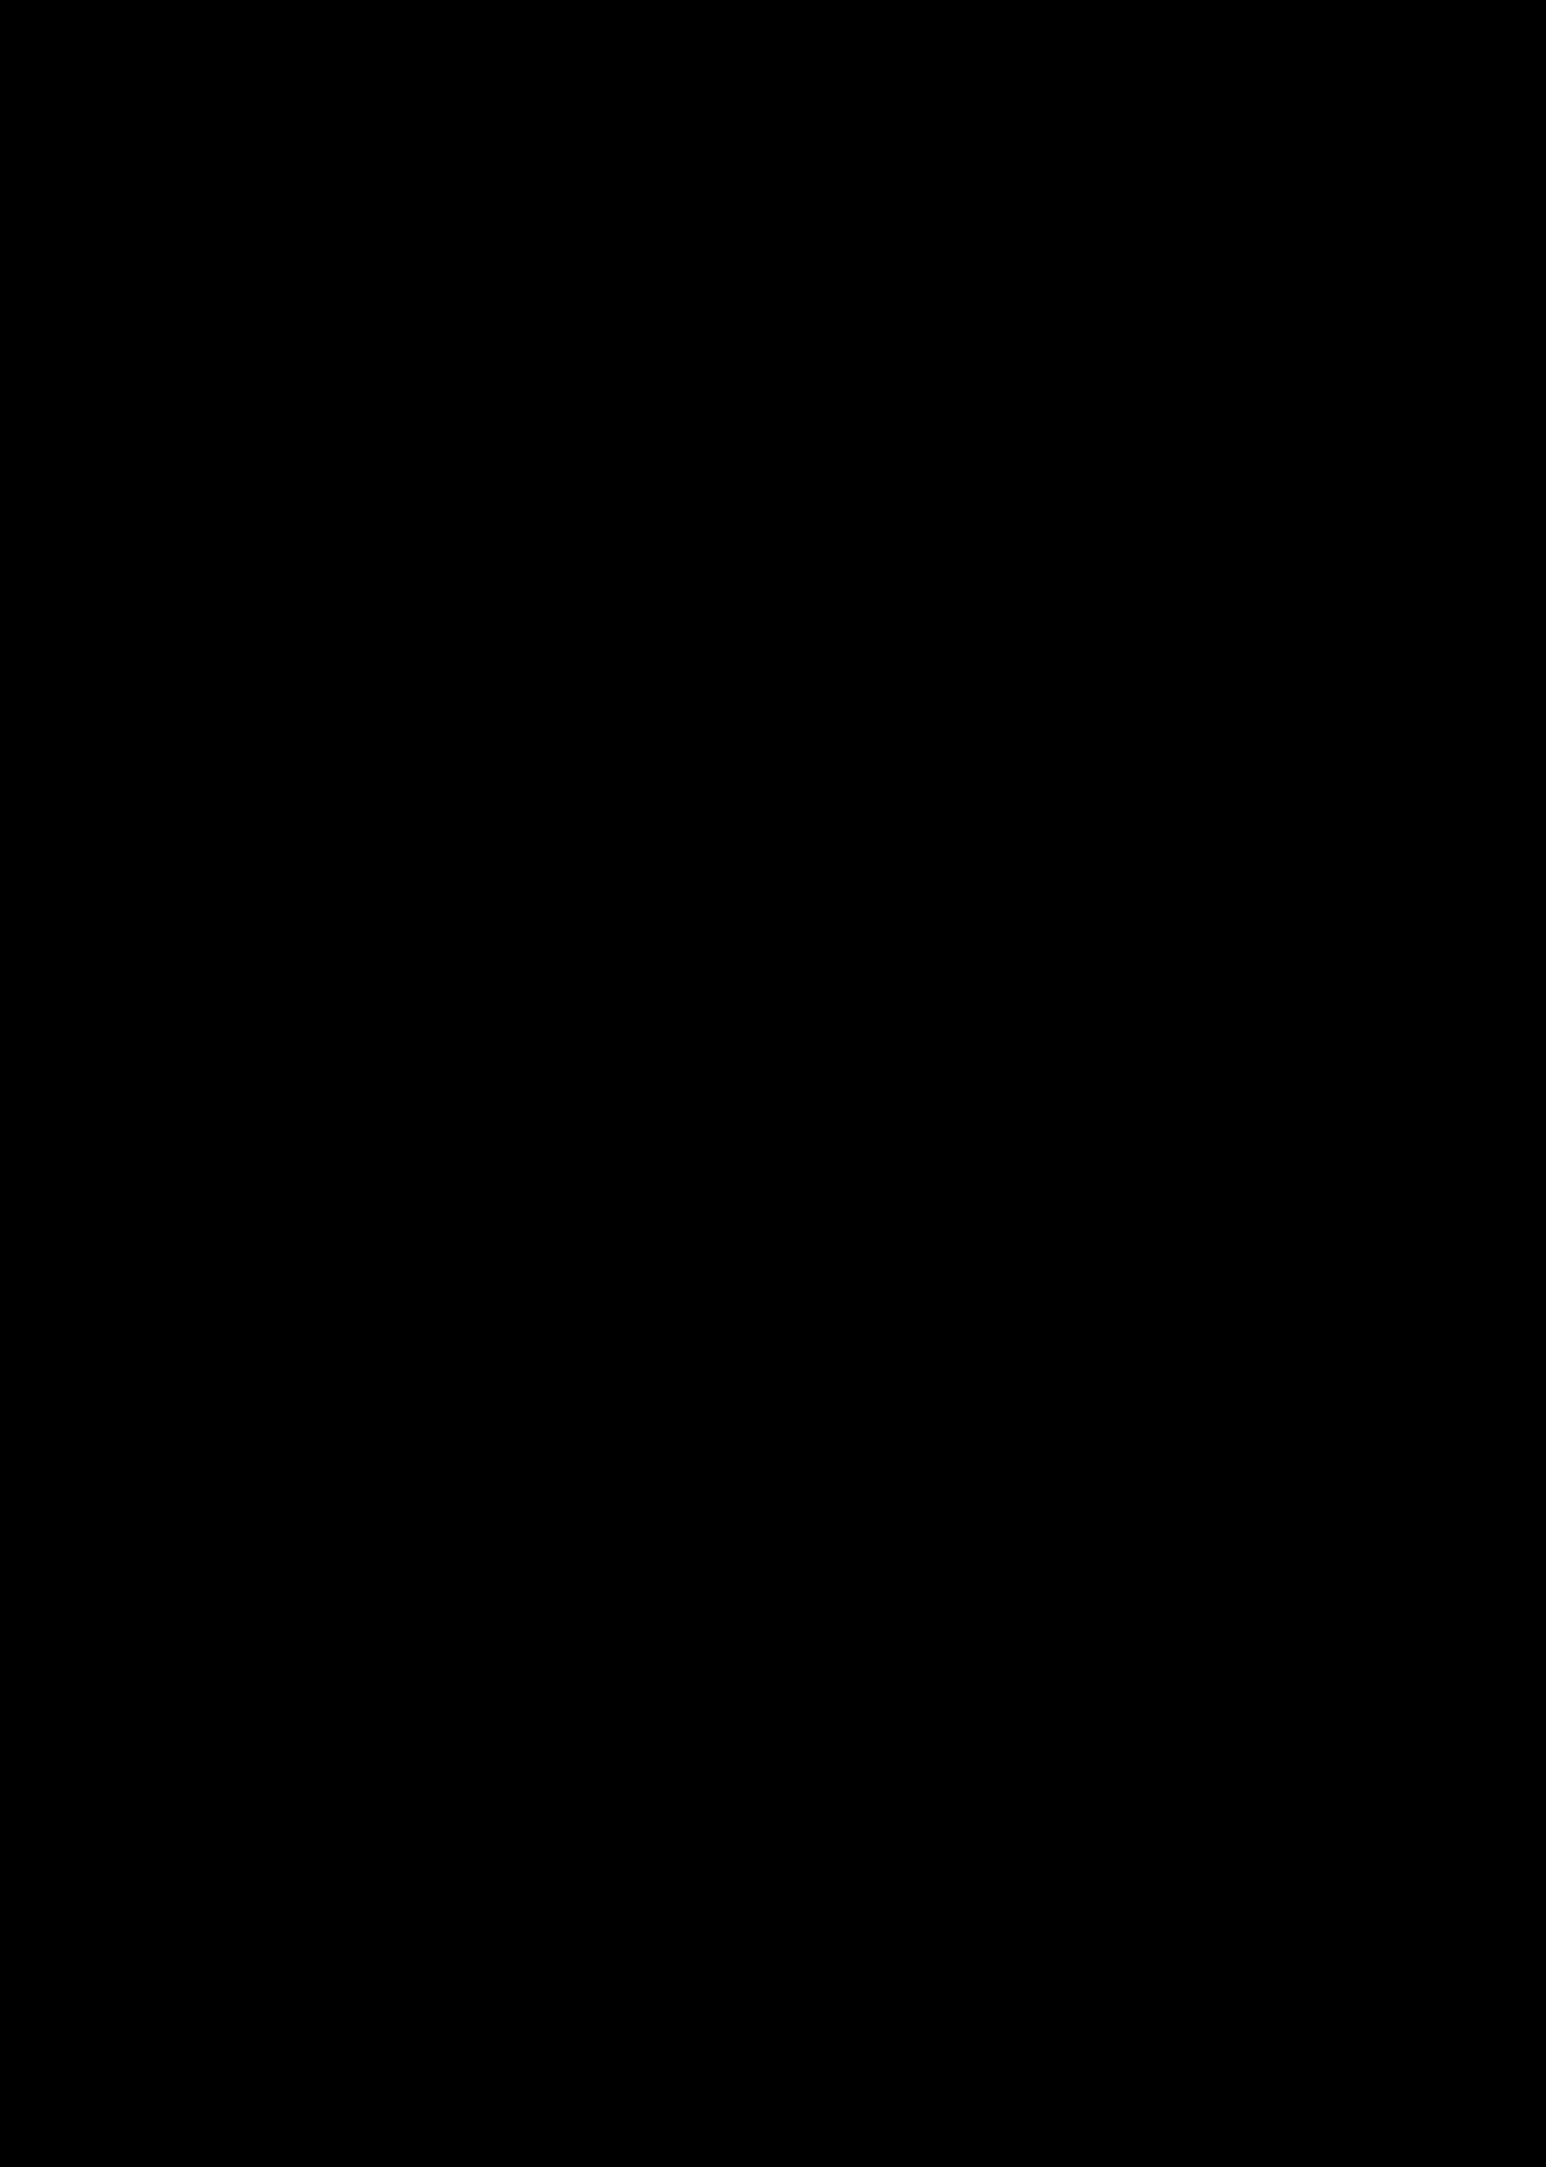 Transparent bonfire clipart - Campfire Outline - Smoke Clipart Black And White